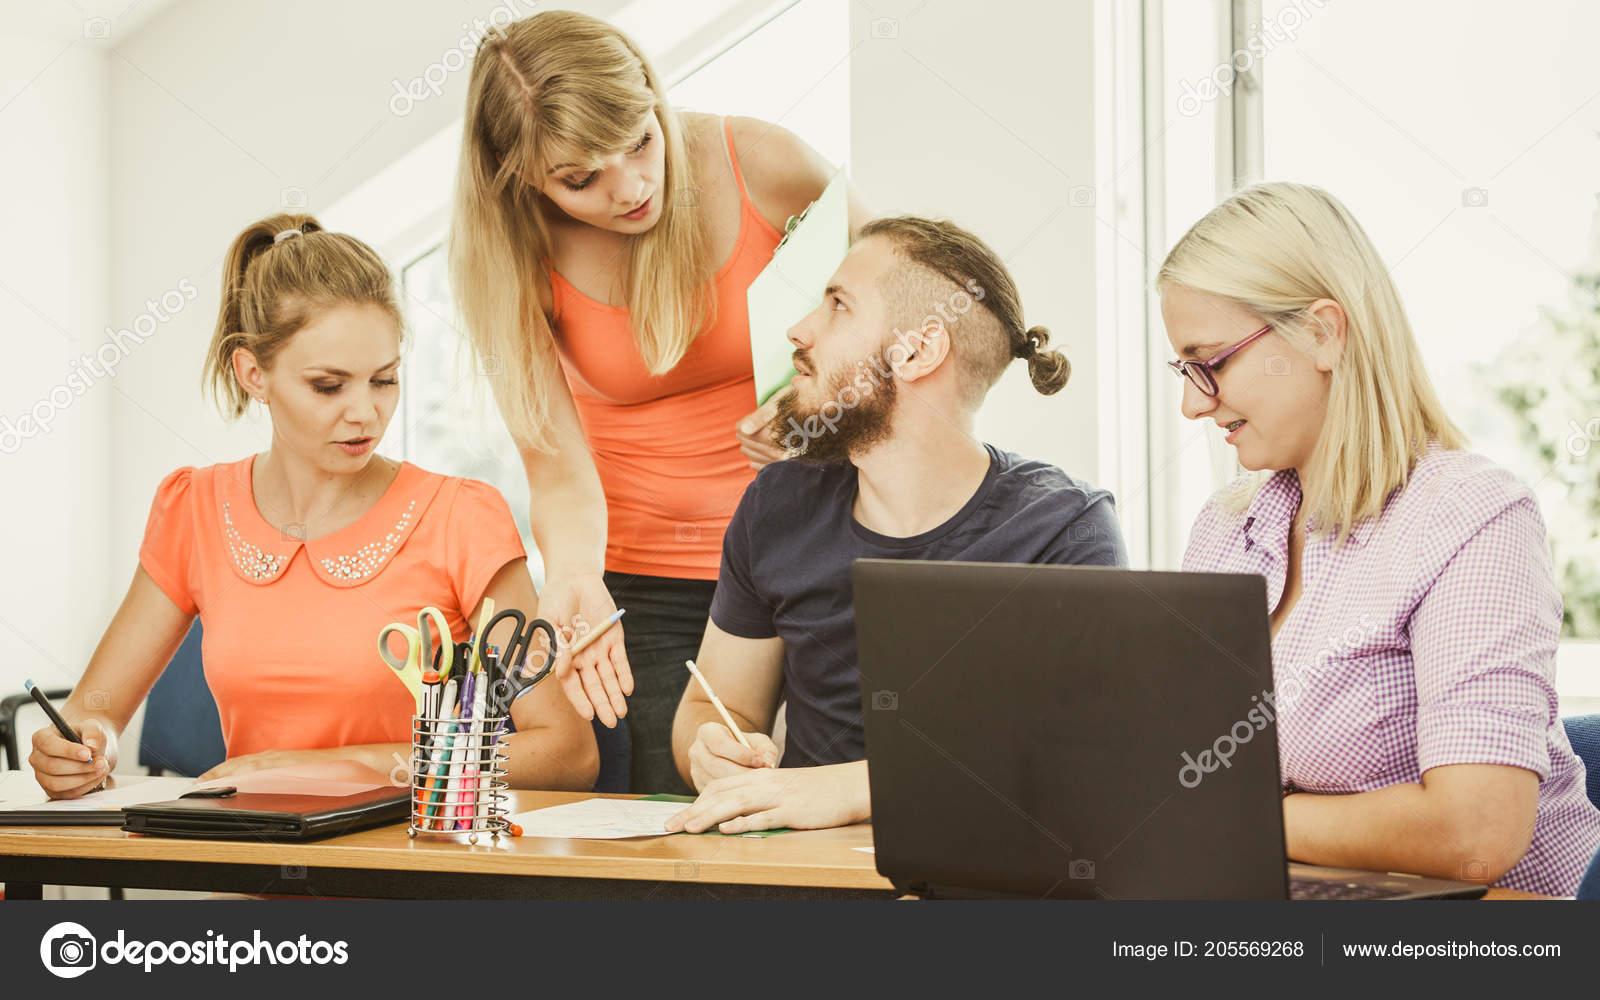 Seldom.. teaching adult using technology